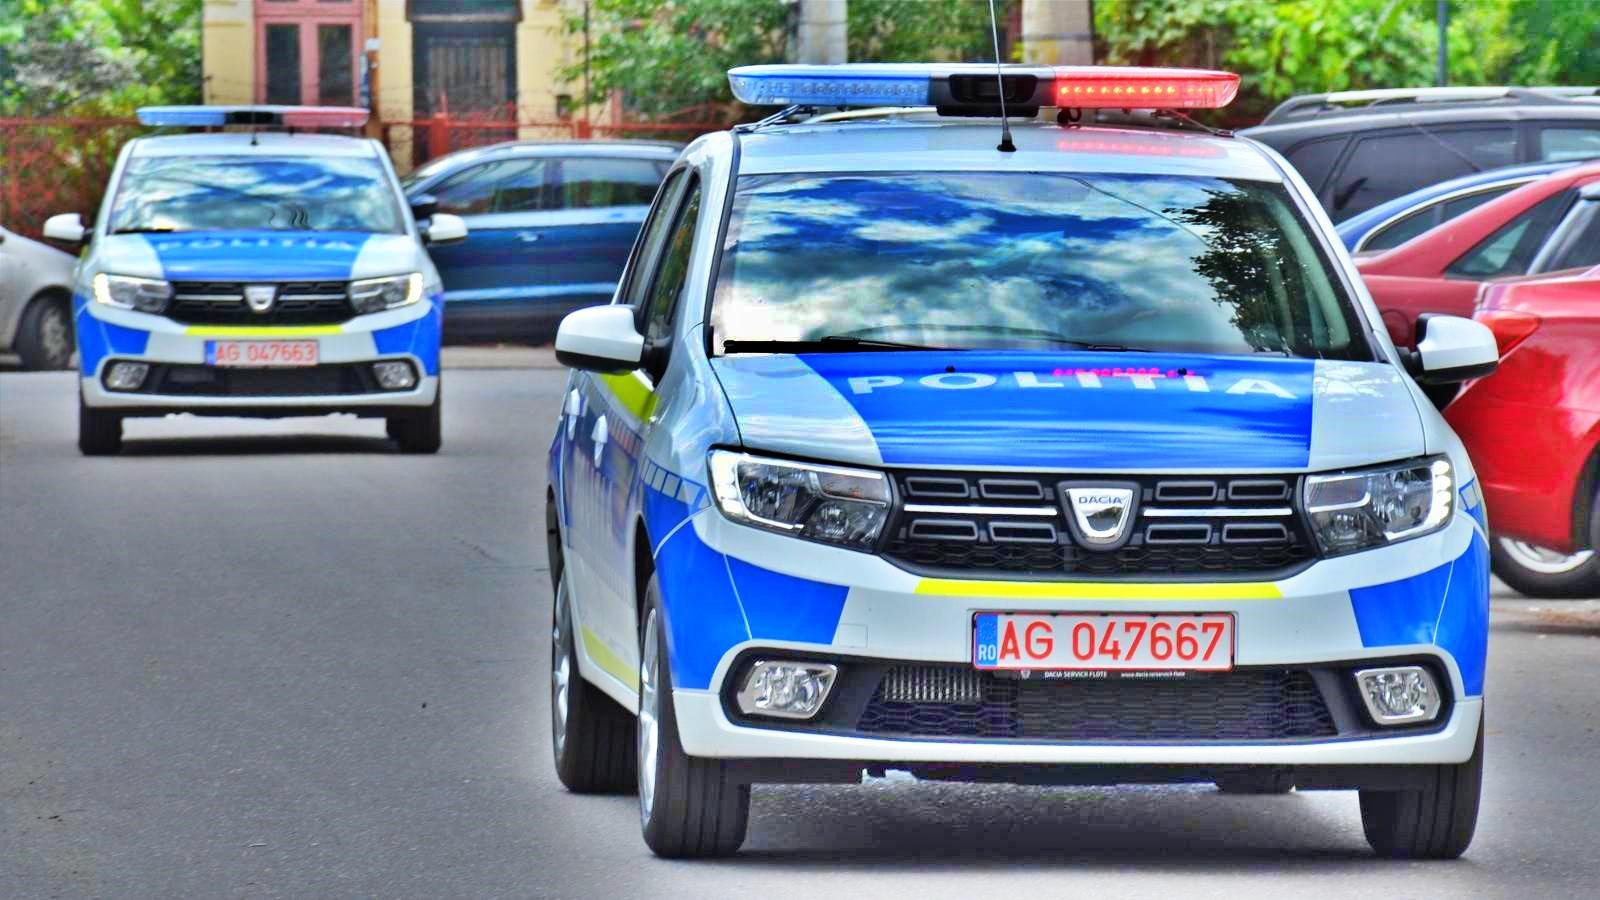 Politia Romana alerta ransomware